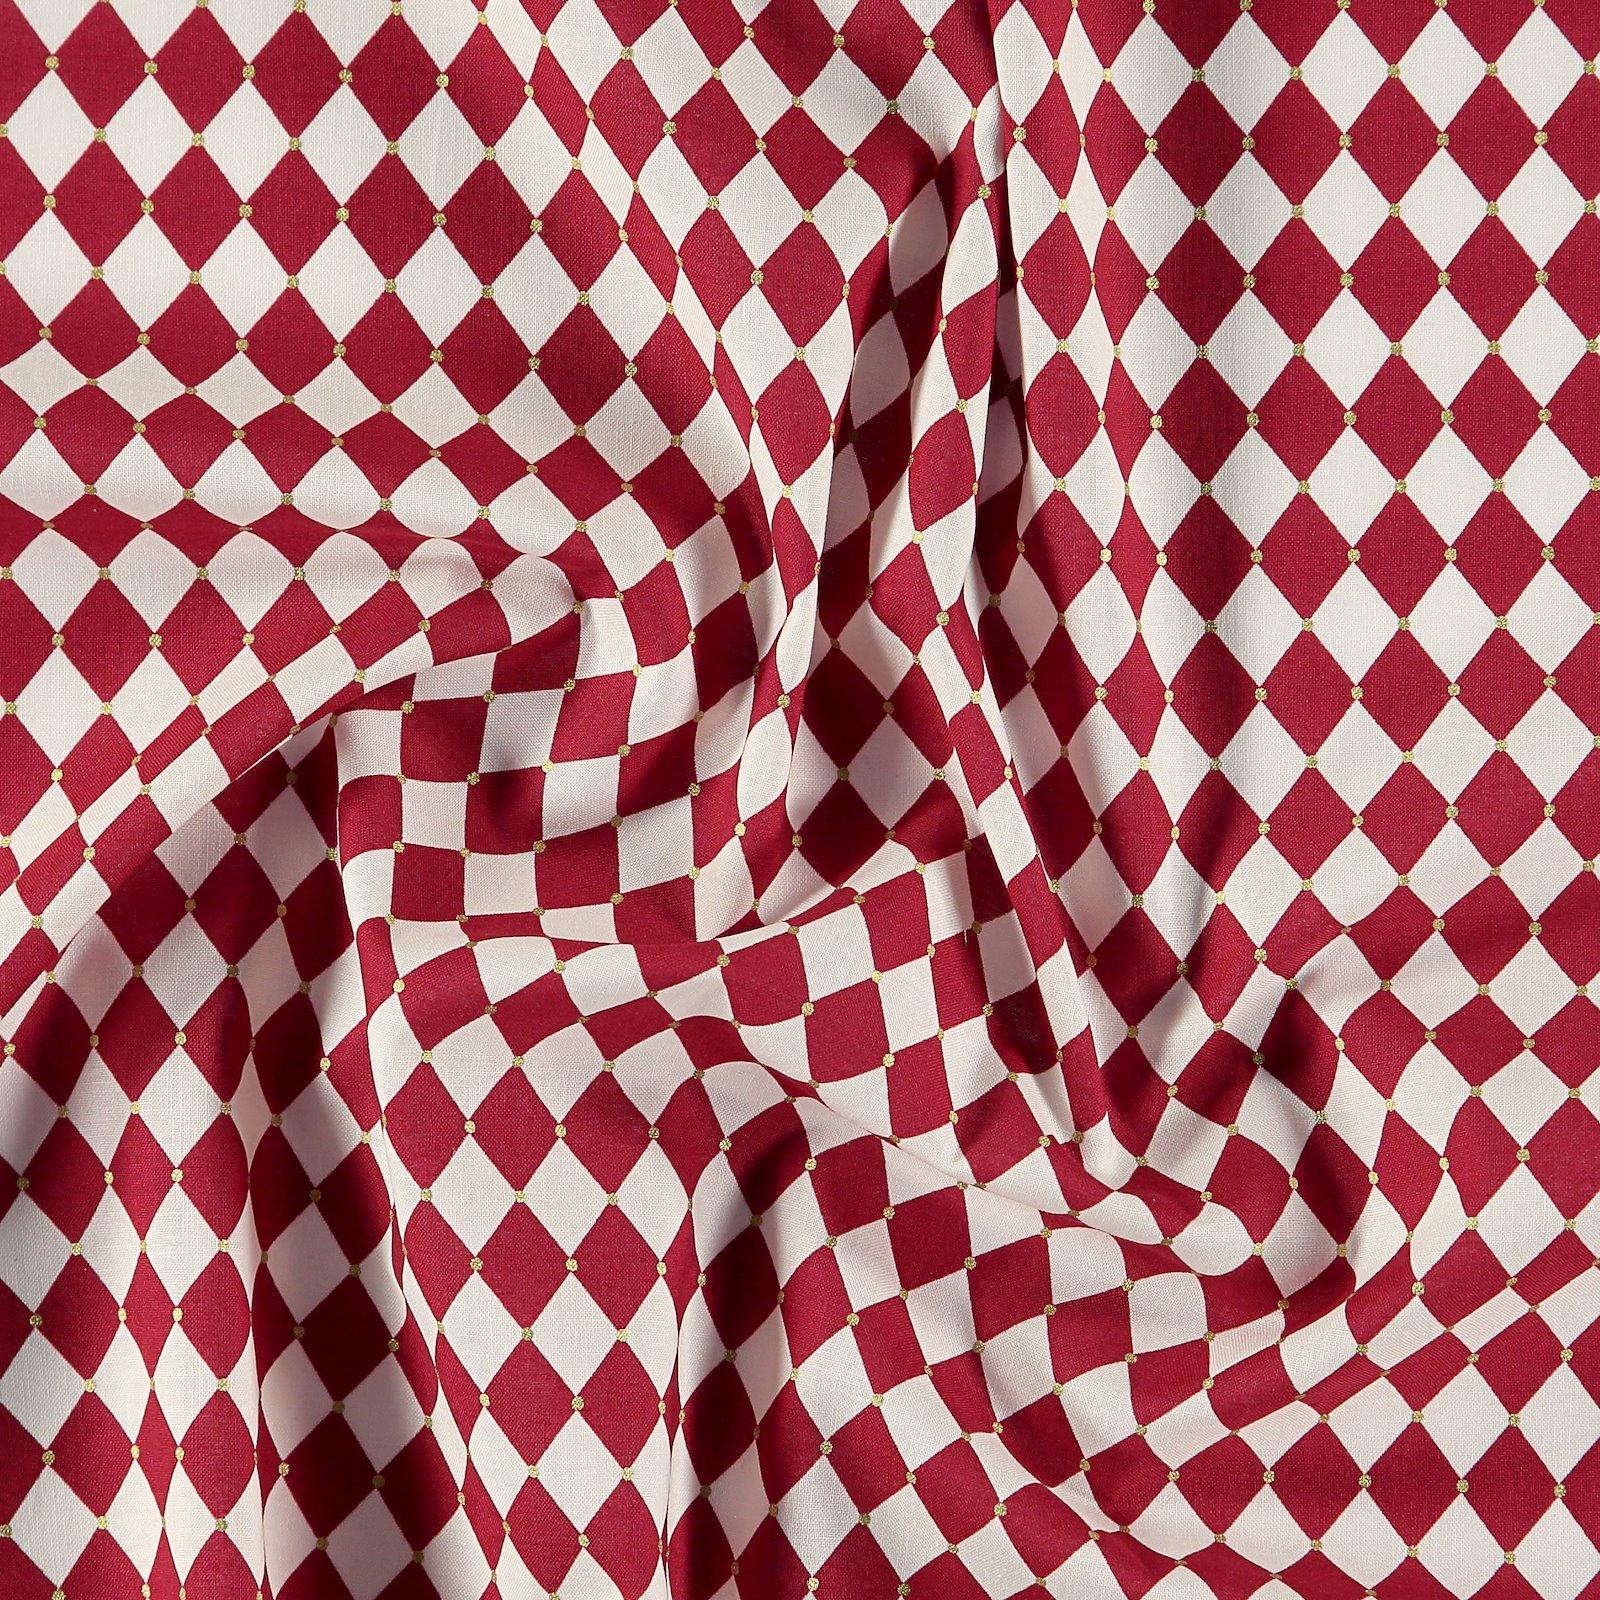 Baumwolle, Rot/Weiß Harlekin kariert 852395_pack